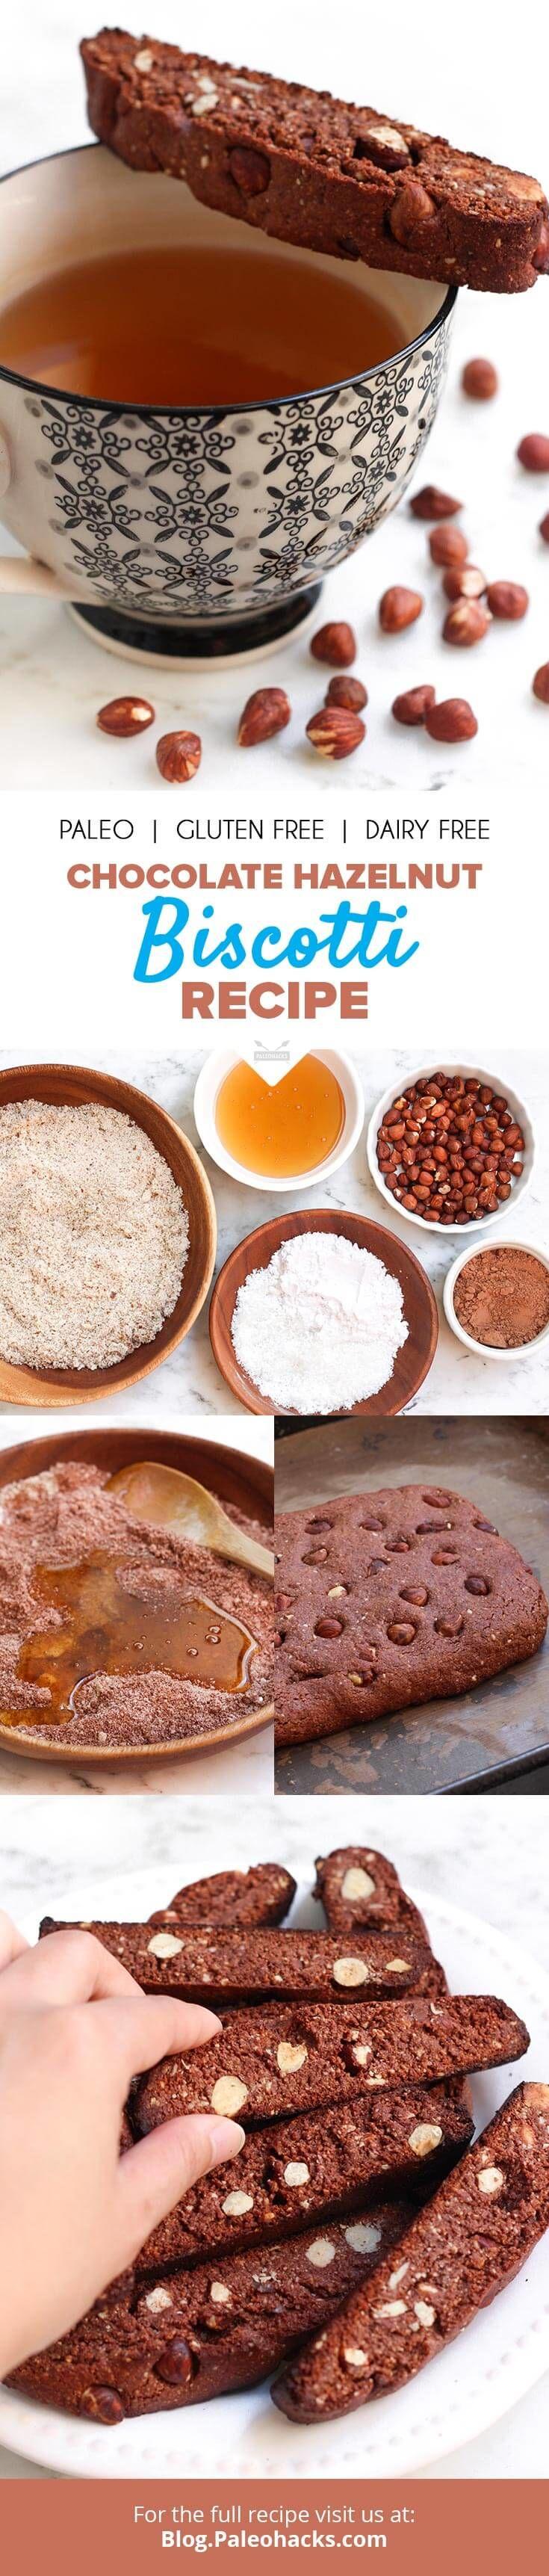 Chocolate Hazelnut Biscotti Recipe | Dairy-Free, Grain-Free